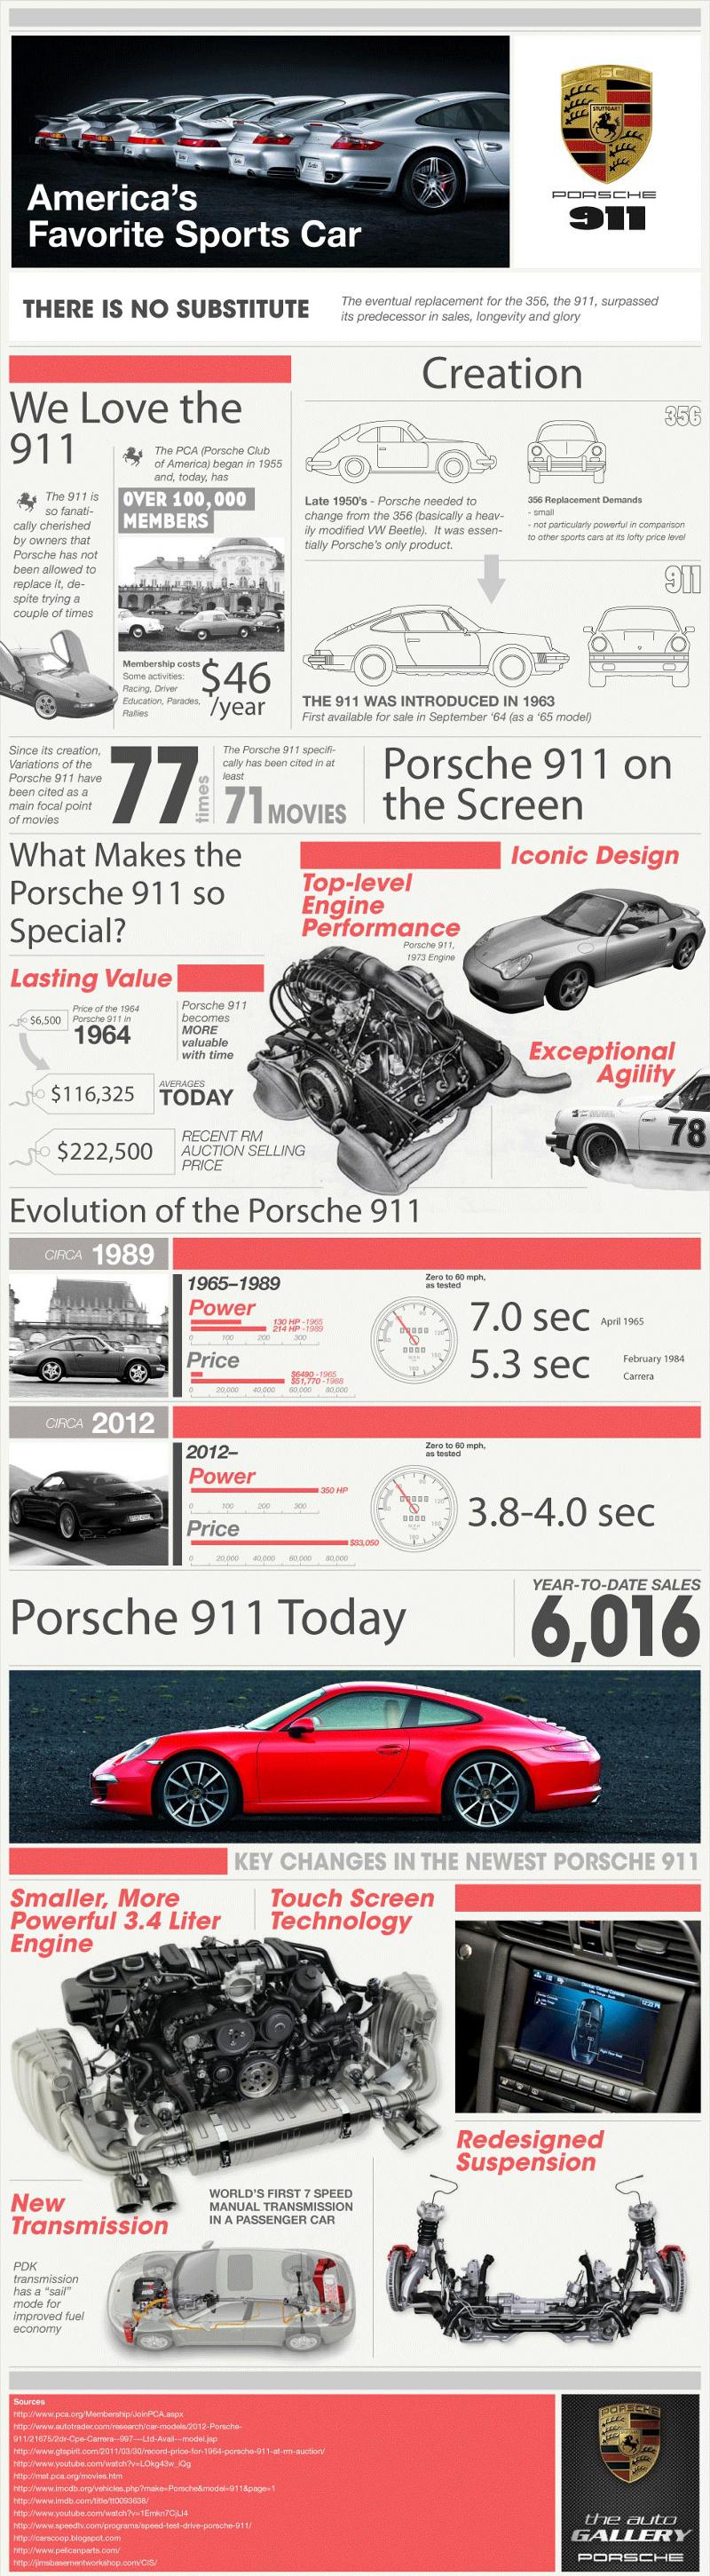 History-of-the-Porsche-911